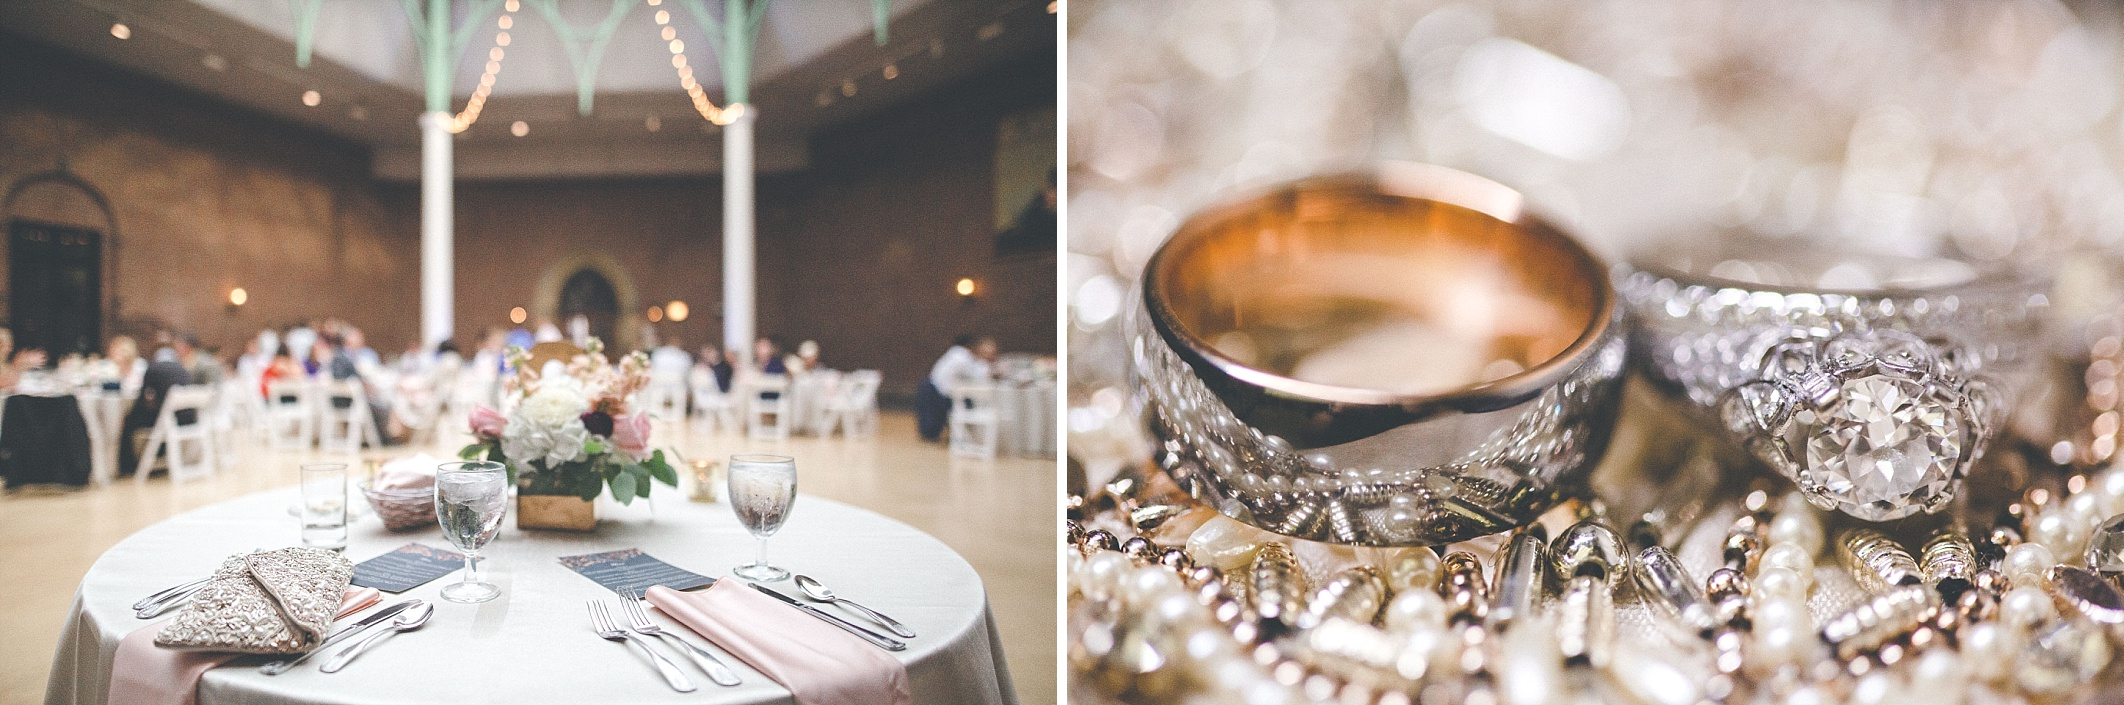 wedding-photographer-dayton-ohio_0020.jpg